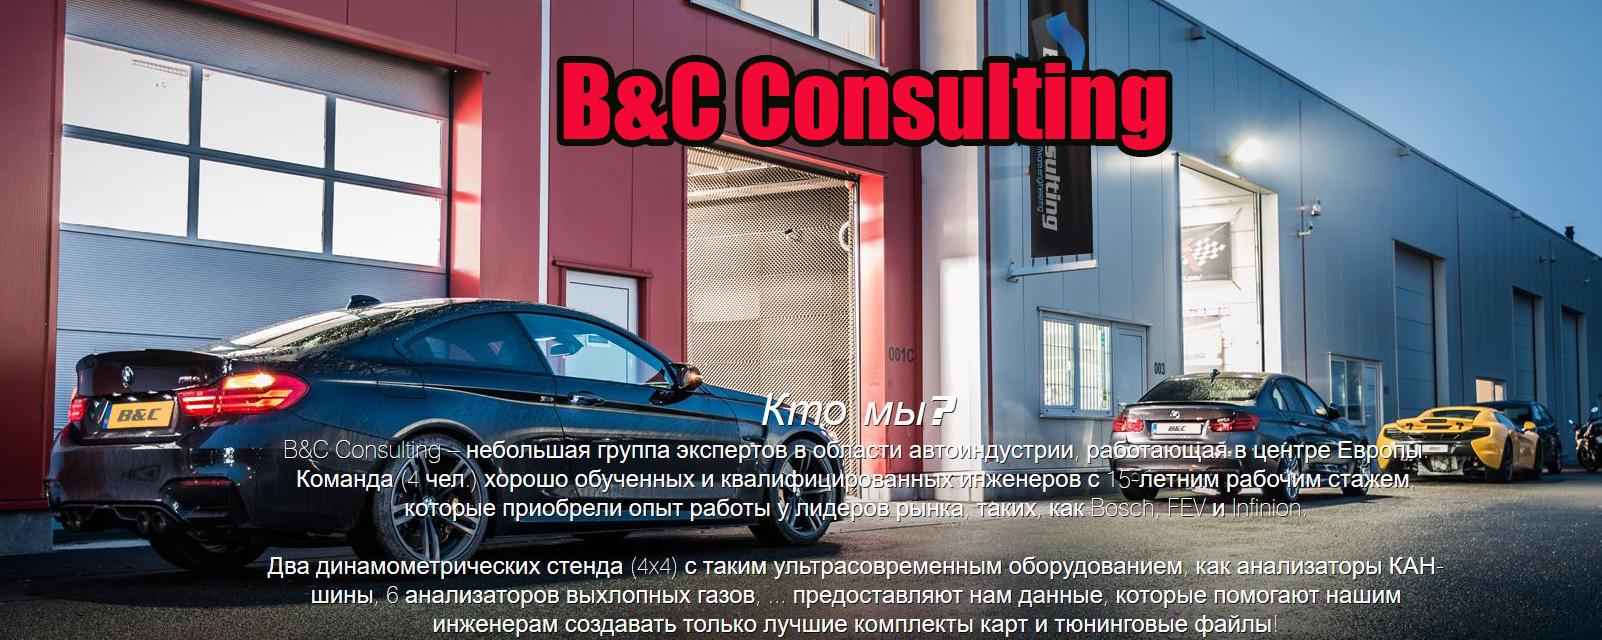 Пакет прошивок от BC consulting 2020